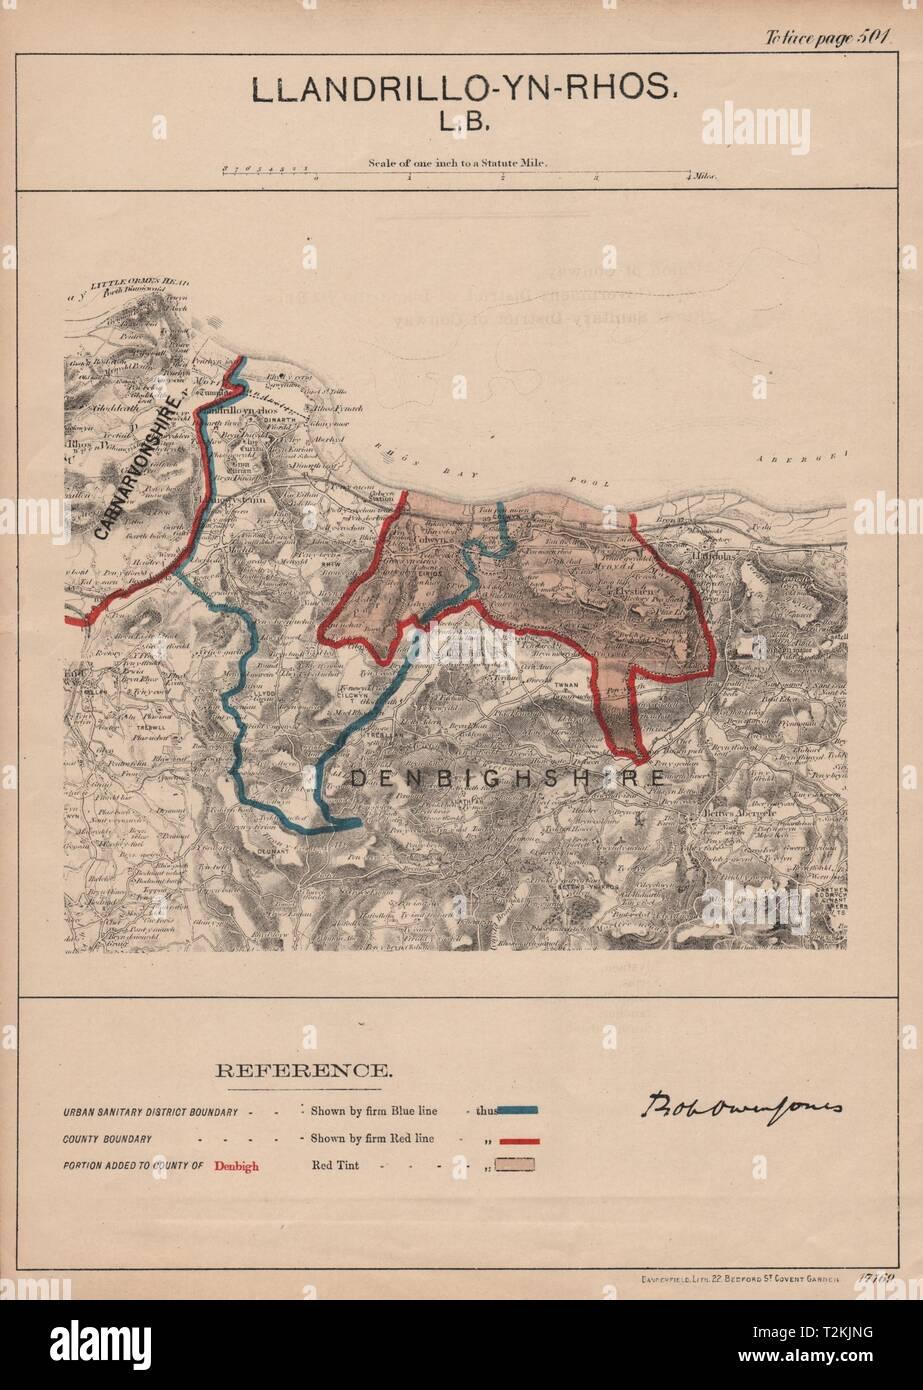 Llandrillo-yn-Rhos-on-Sea. JONES. PARLIAMENTARY BOUNDARY COMMISSION 1888 map - Stock Image